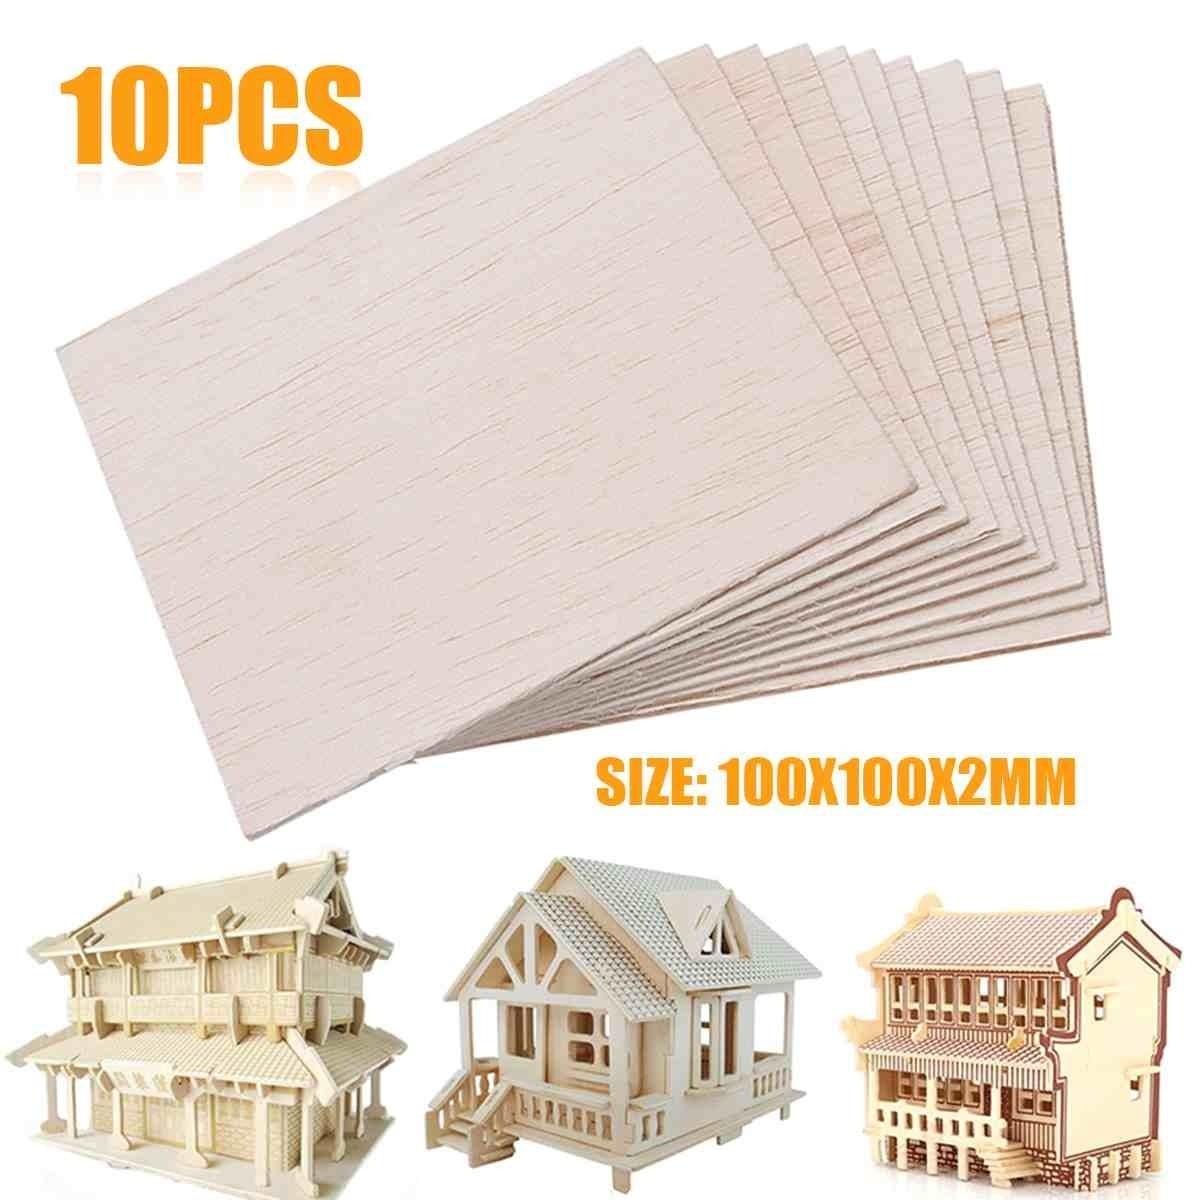 10Pcs 100x100x2mm Wooden Plate Model Balsa Wood Sheets DIY House Ship Aircraft